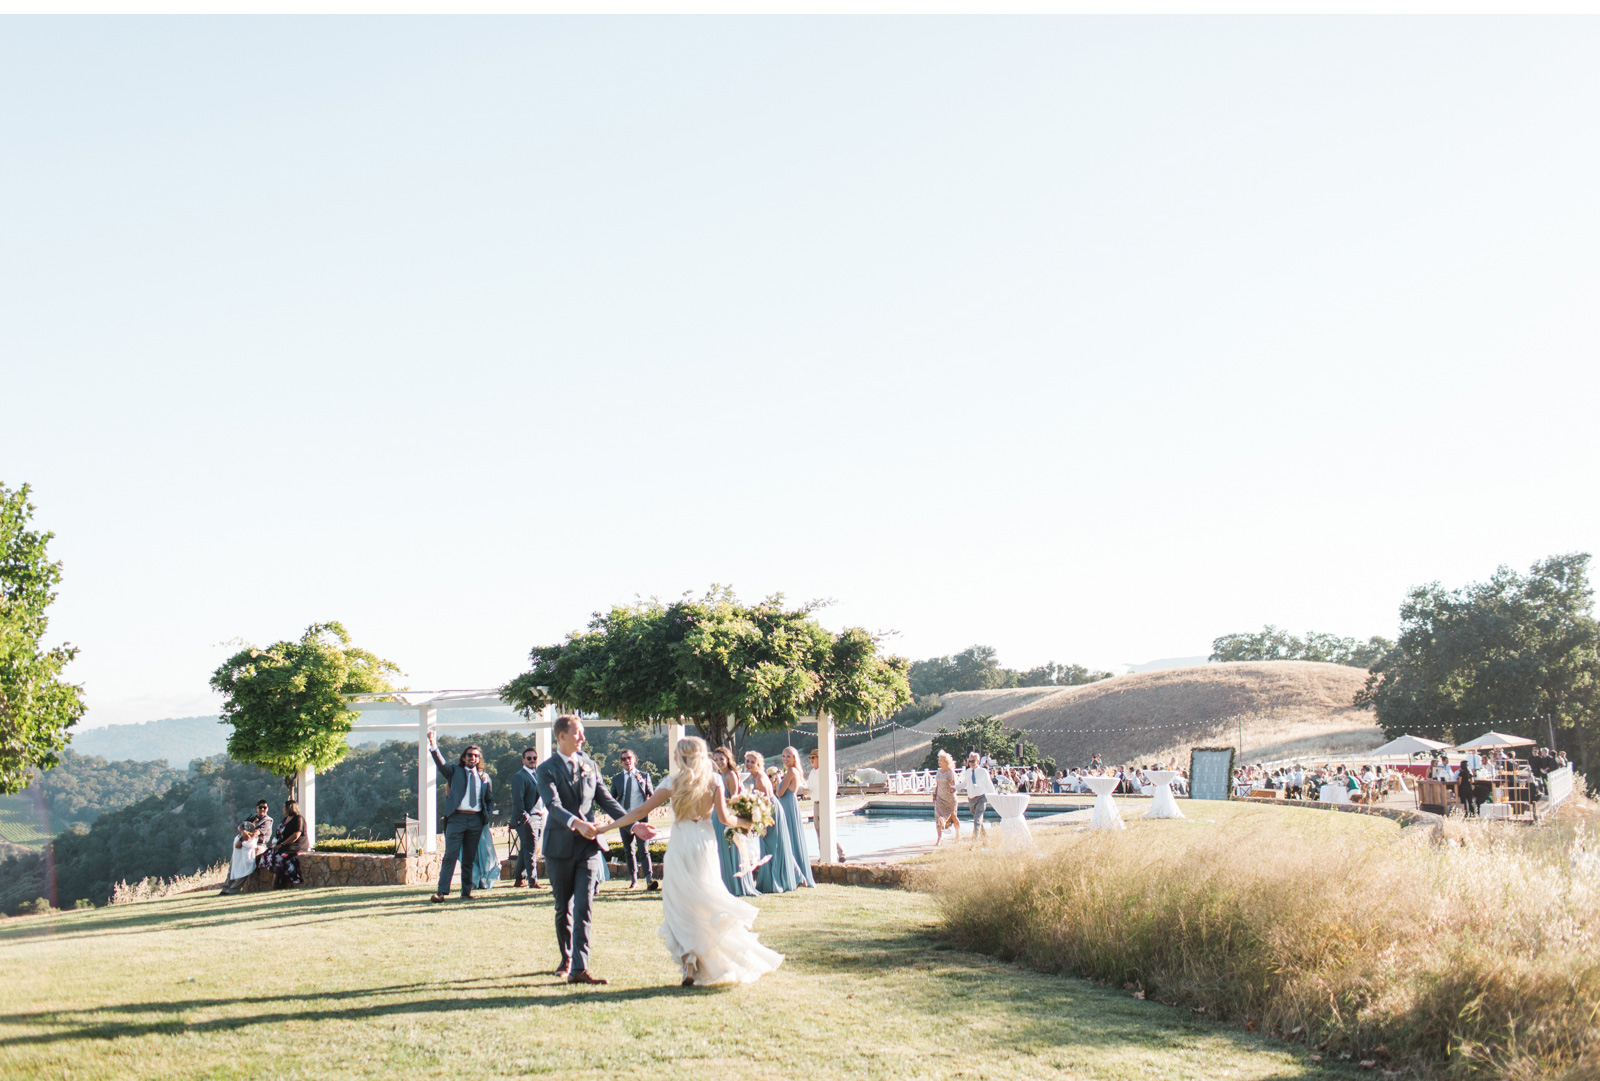 Style-Me-Pretty-California-Wedding-San-Luis-Obispo-Paso-Robles-Natalie-Schutt-Photography_13.jpg